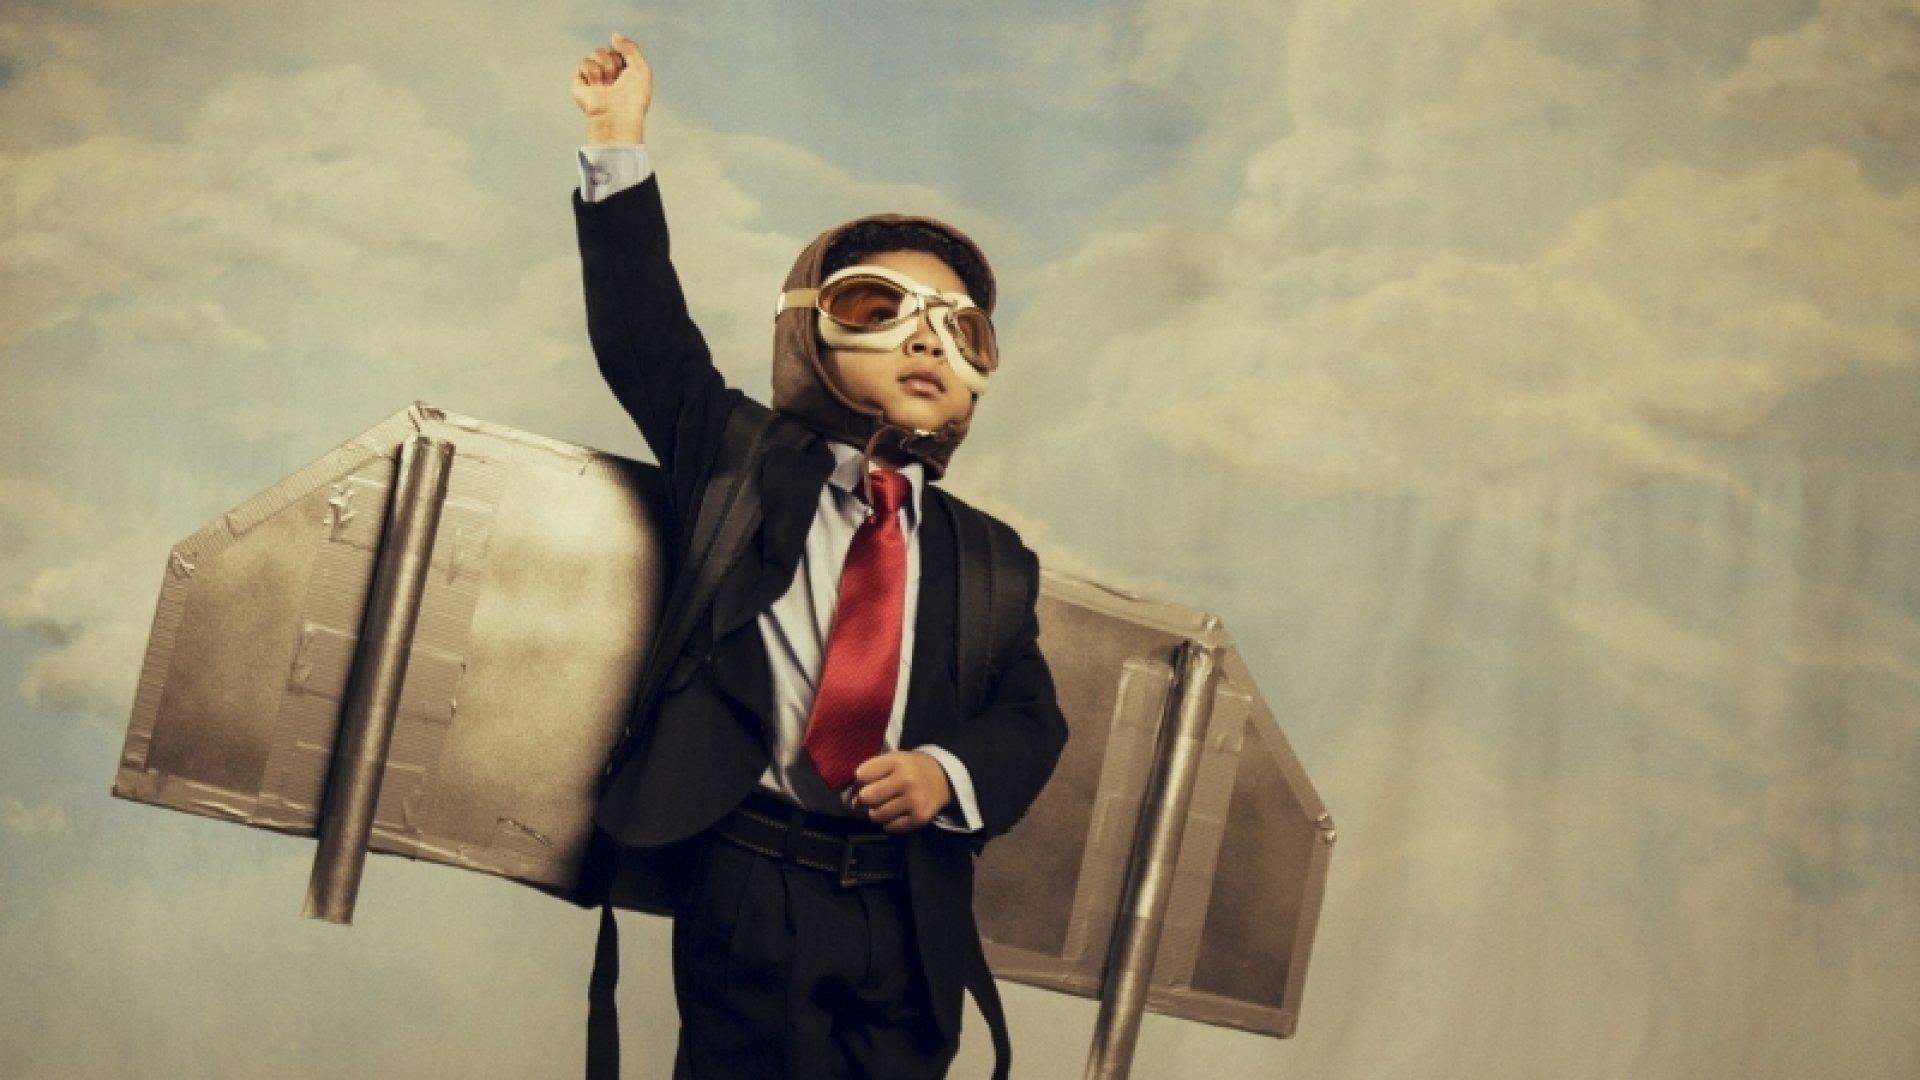 10 Ways to Work Smarter Instead of Harder